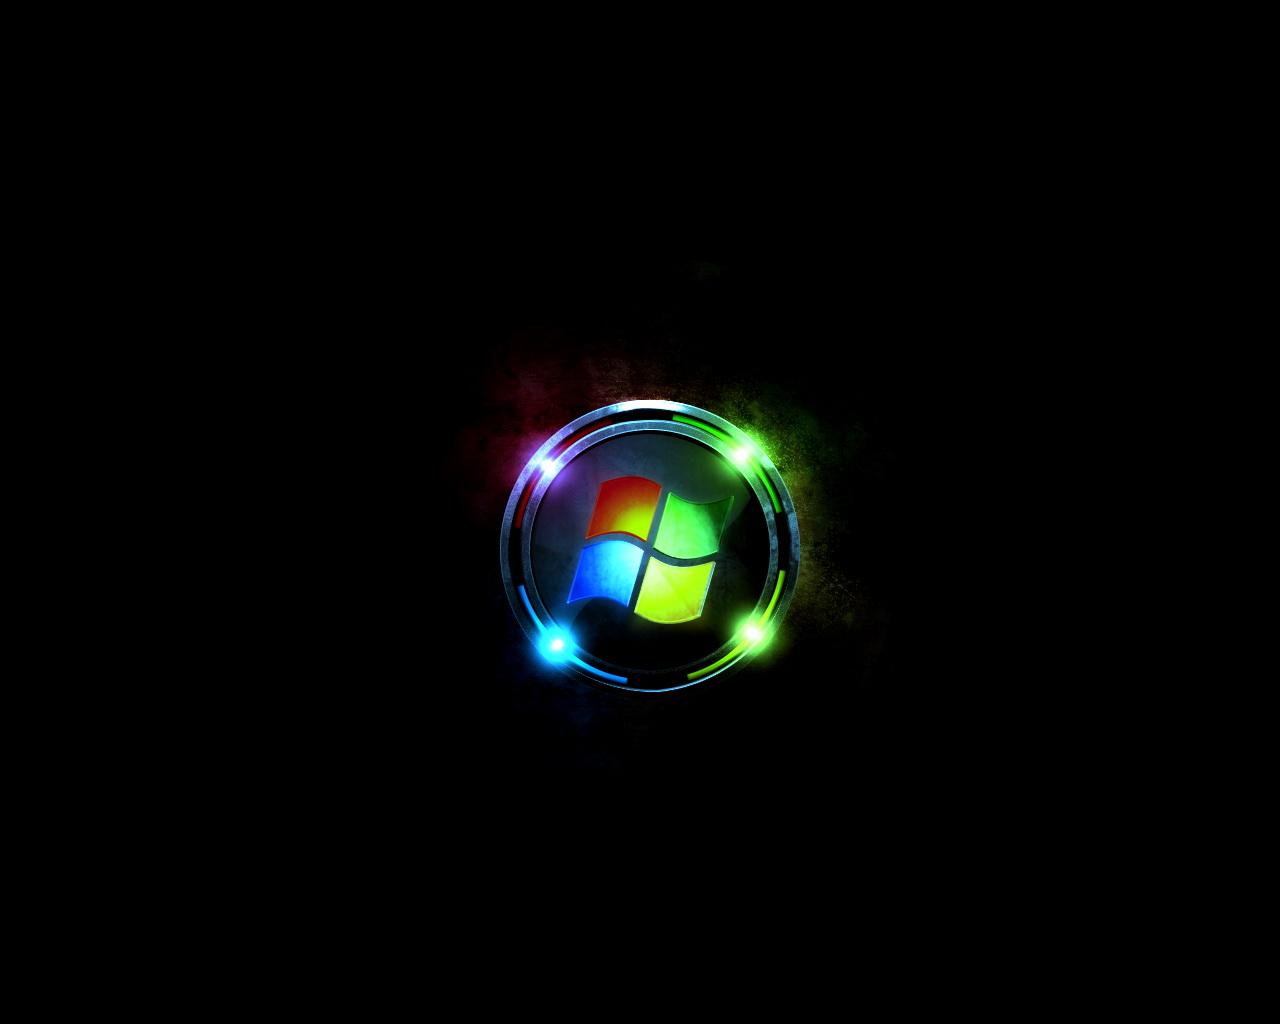 HD Wallpaper Art: HD Windows 7 wallpaper ( Pack-100+ W7 logo )